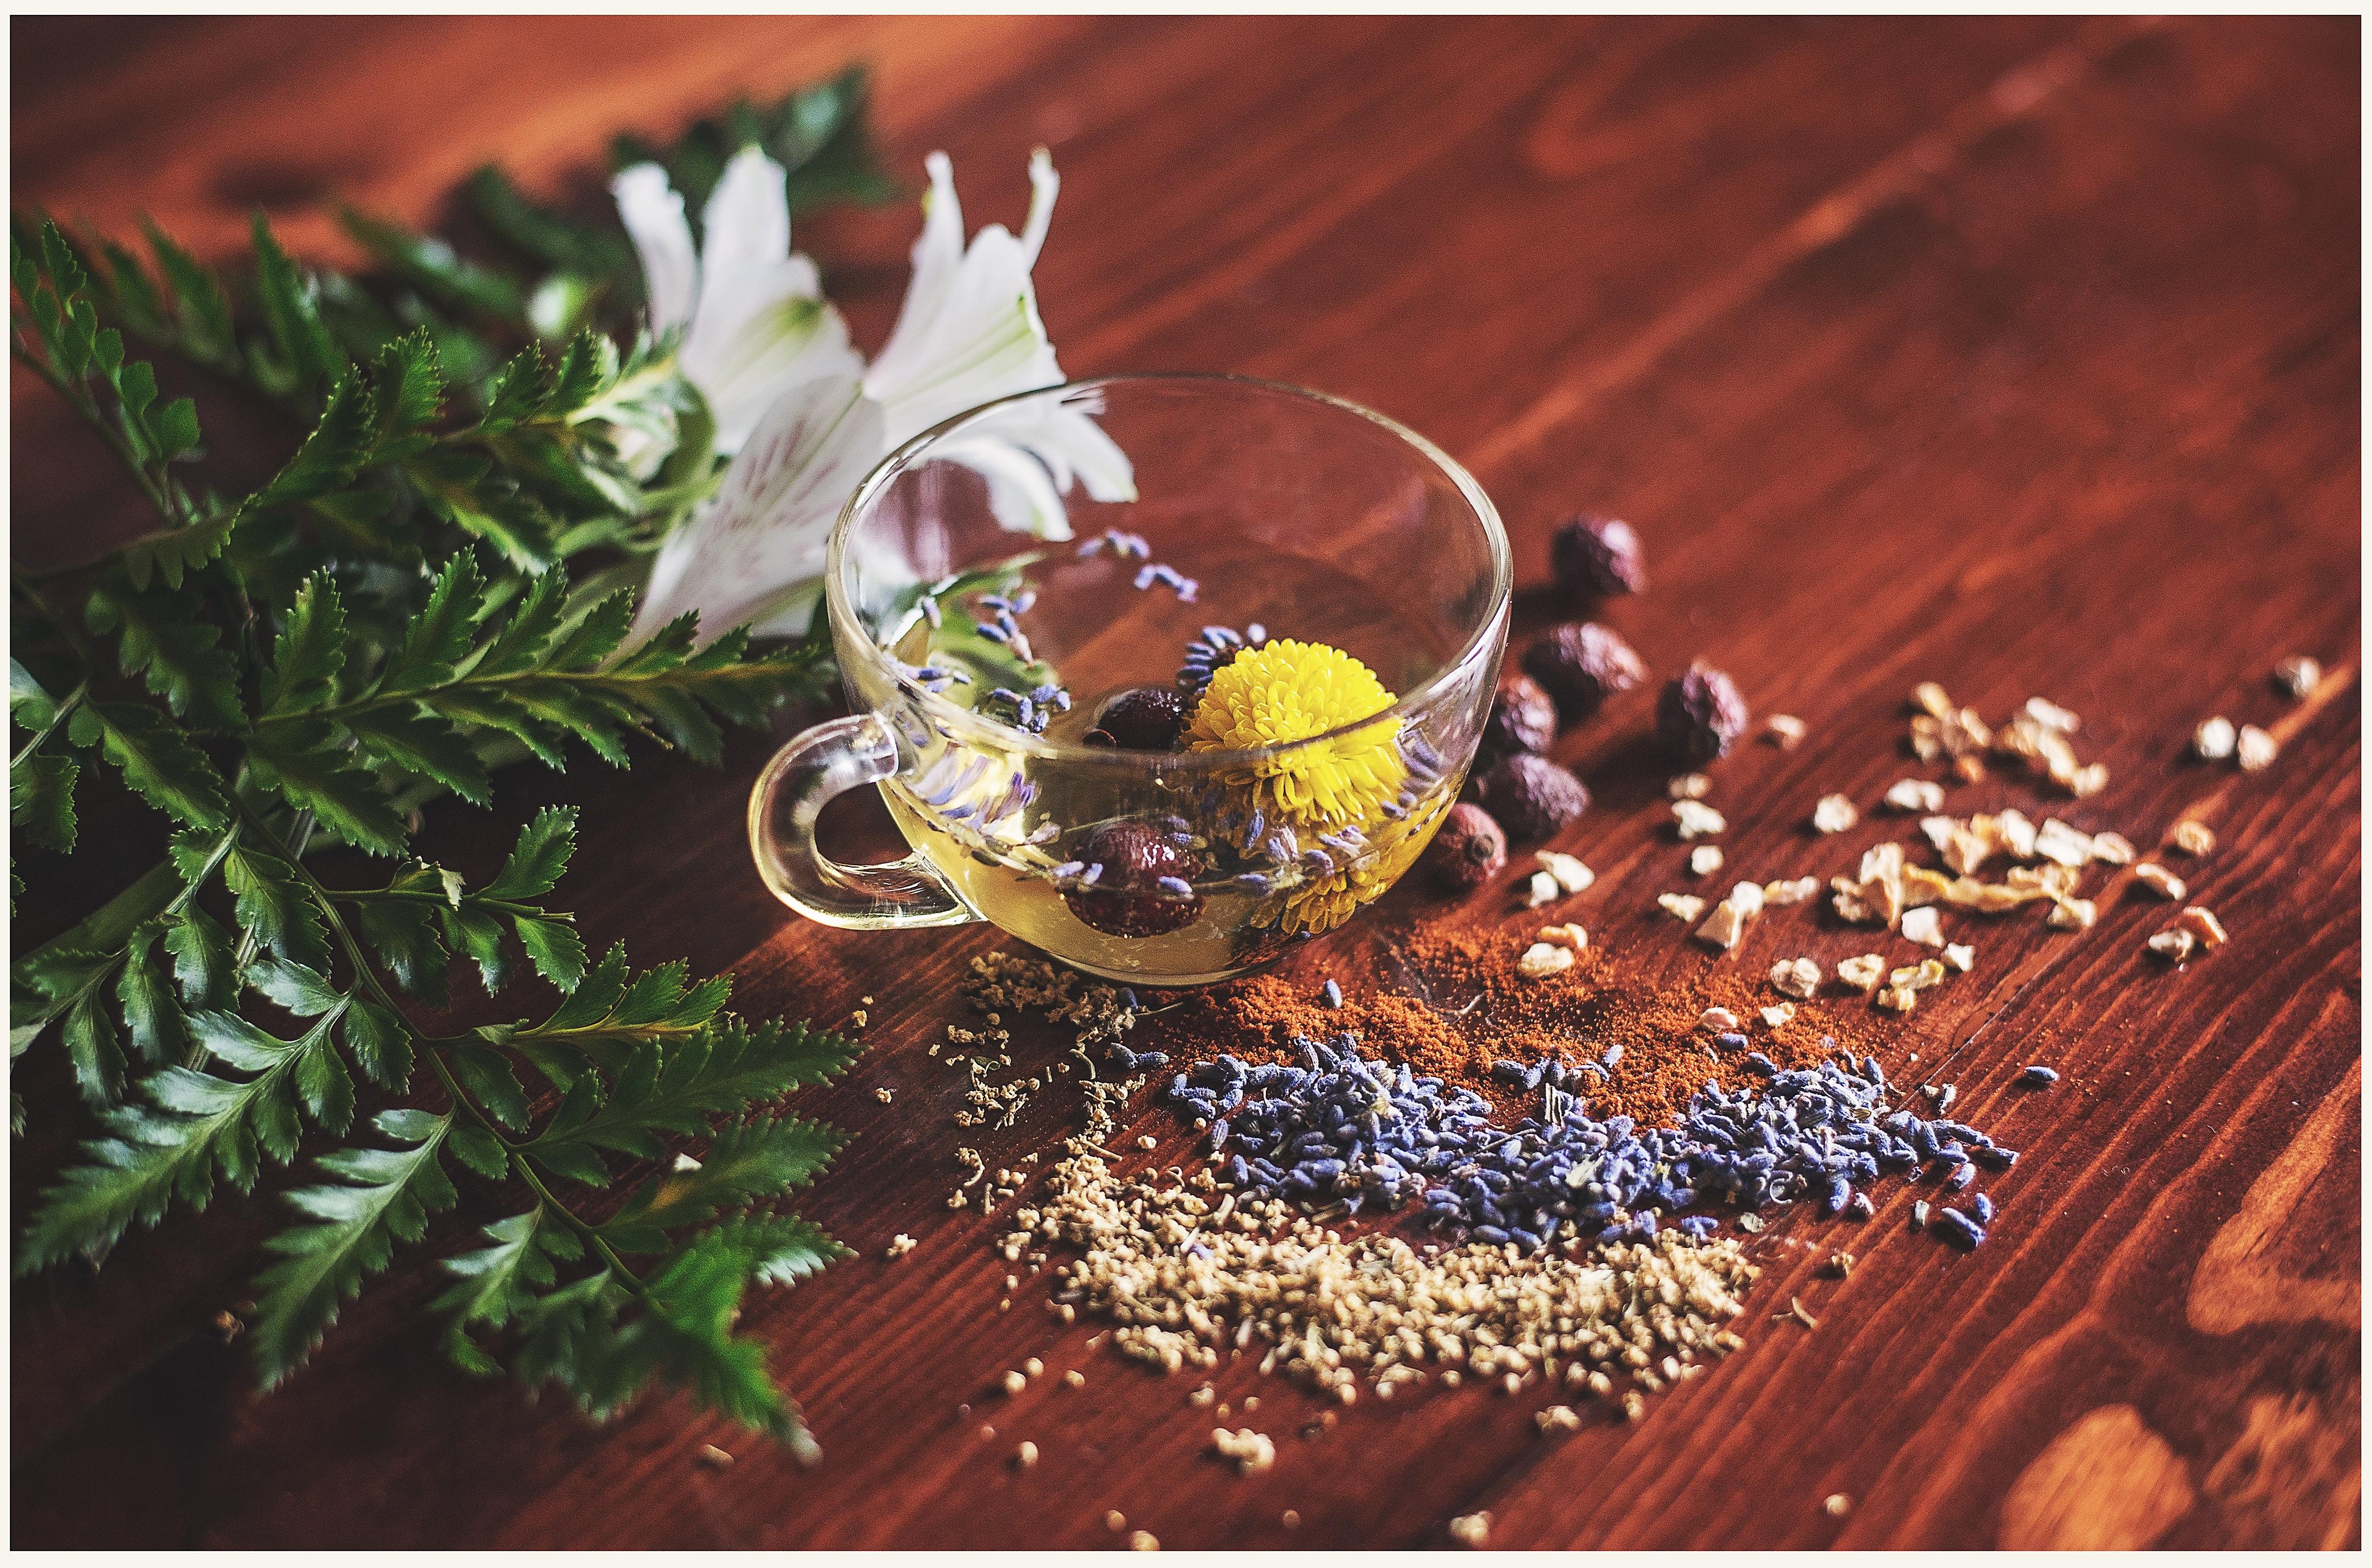 vanessa-lopez-blog-naturopathie-remboursement-reiki-naturopathie